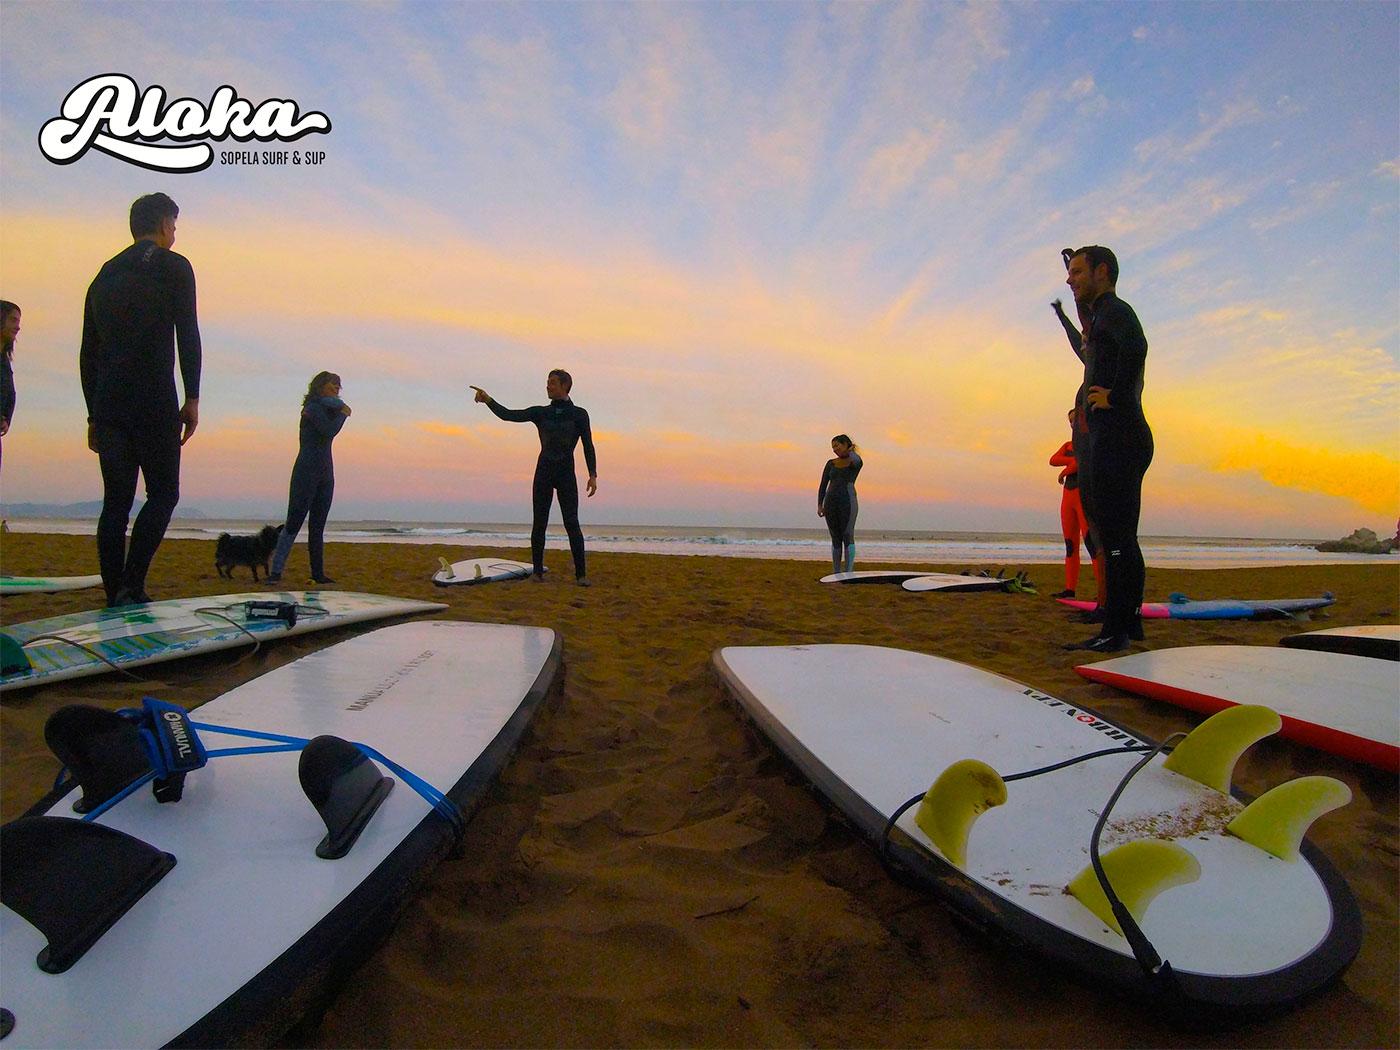 Aloka Sopela Surf & Sup